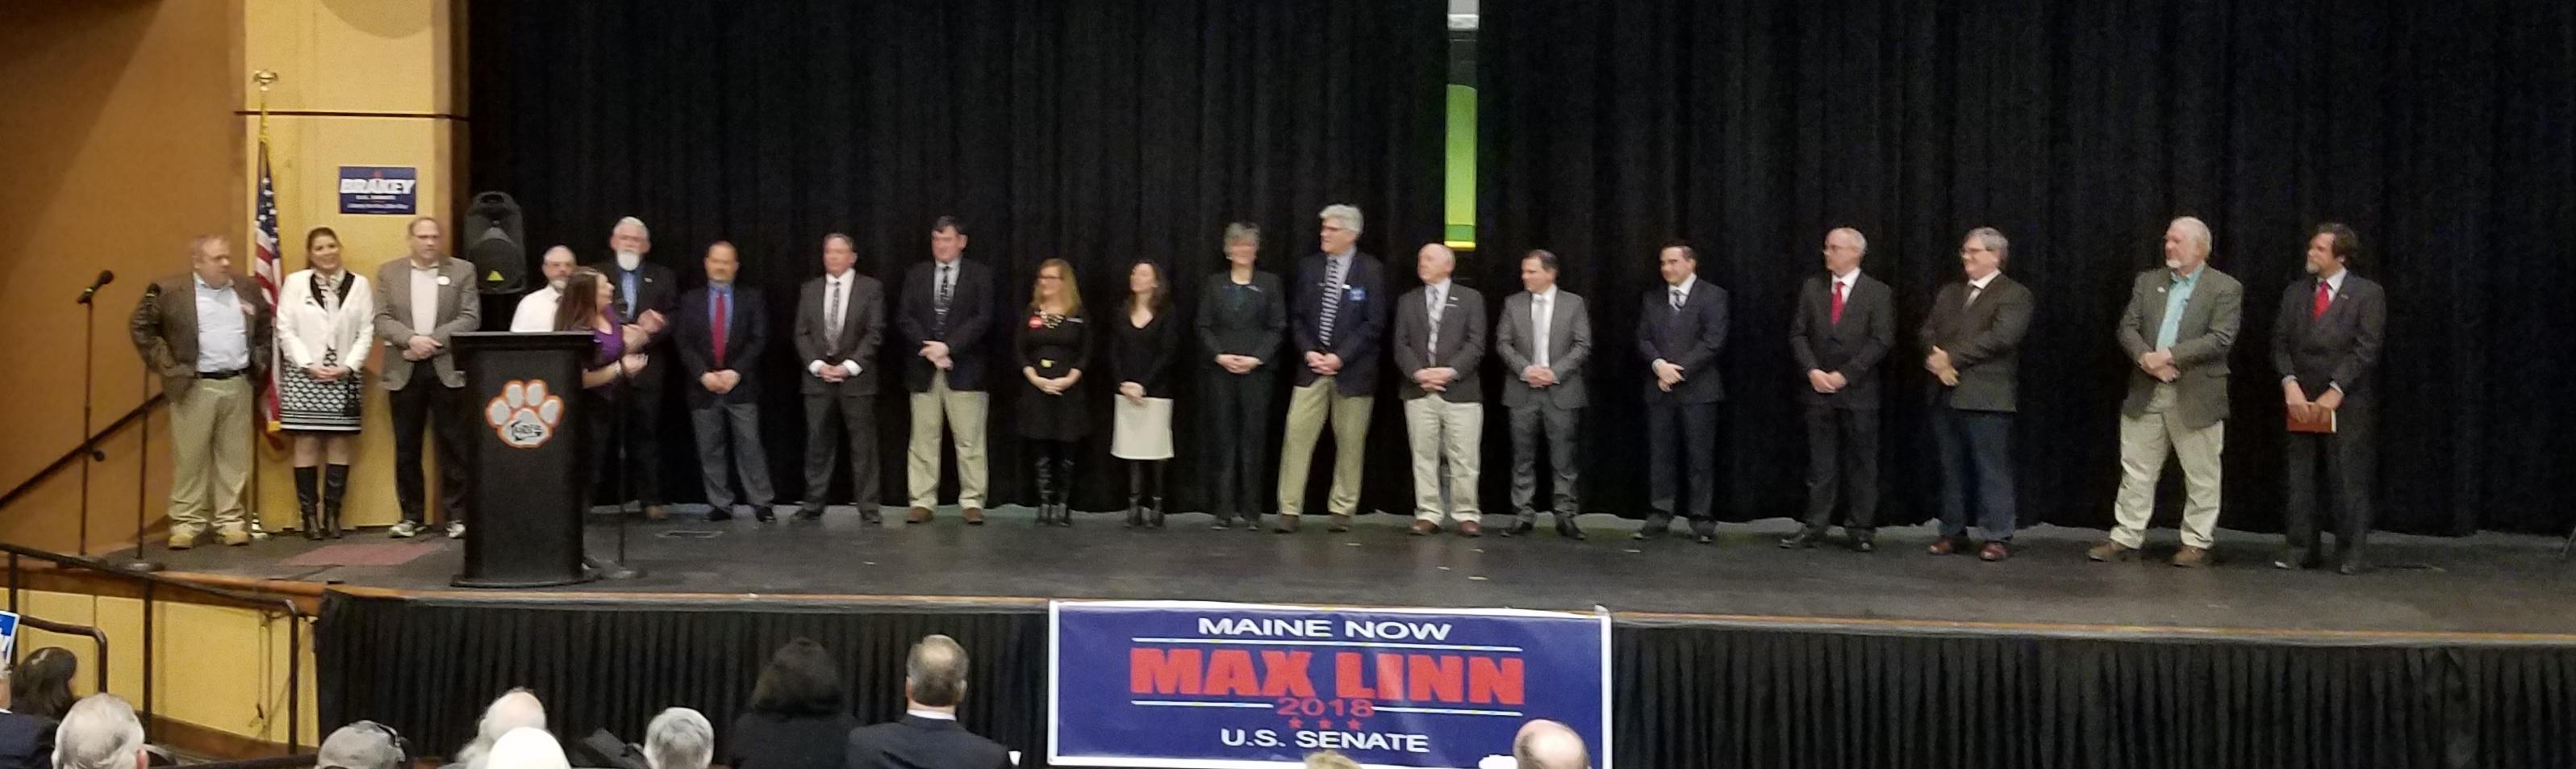 statecandidates